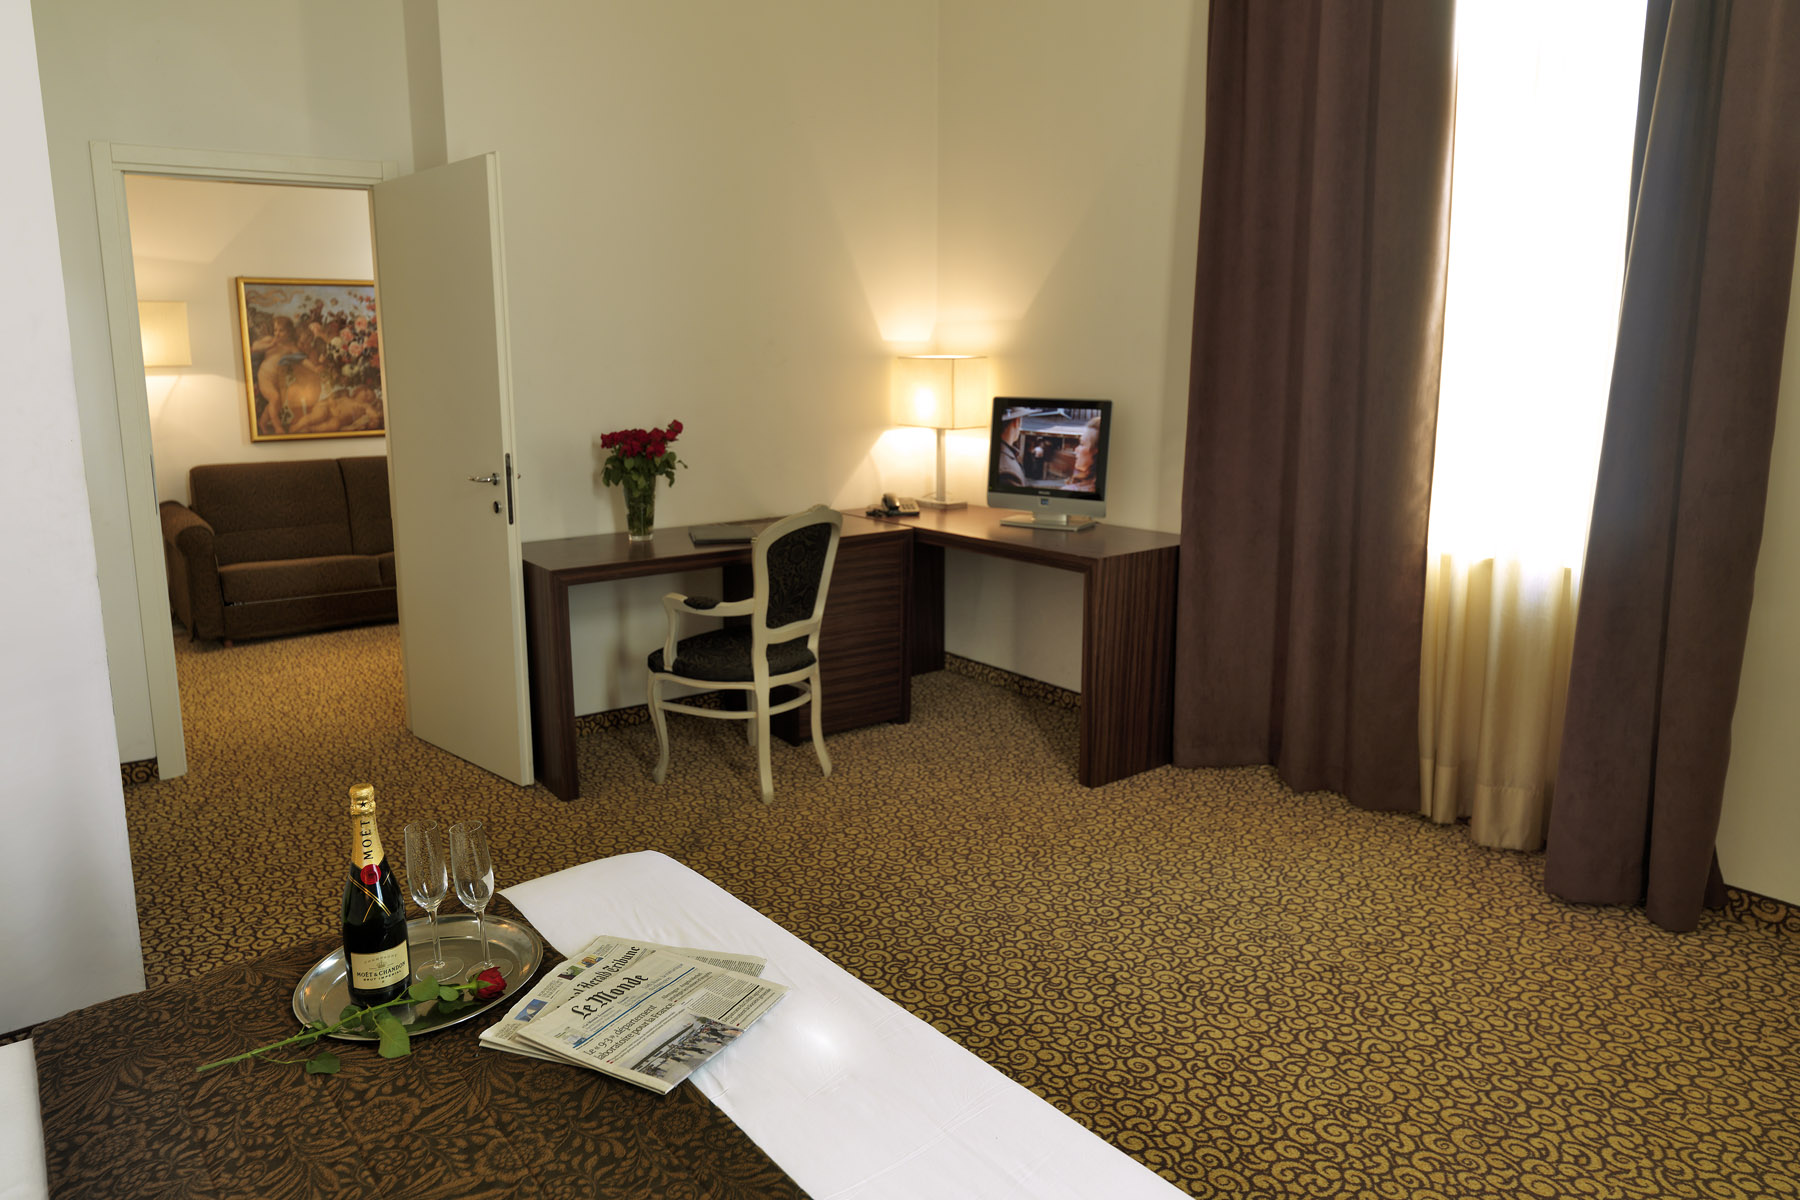 Camere suites assenzio hotel praga for Piani di aggiunta di suite in legge